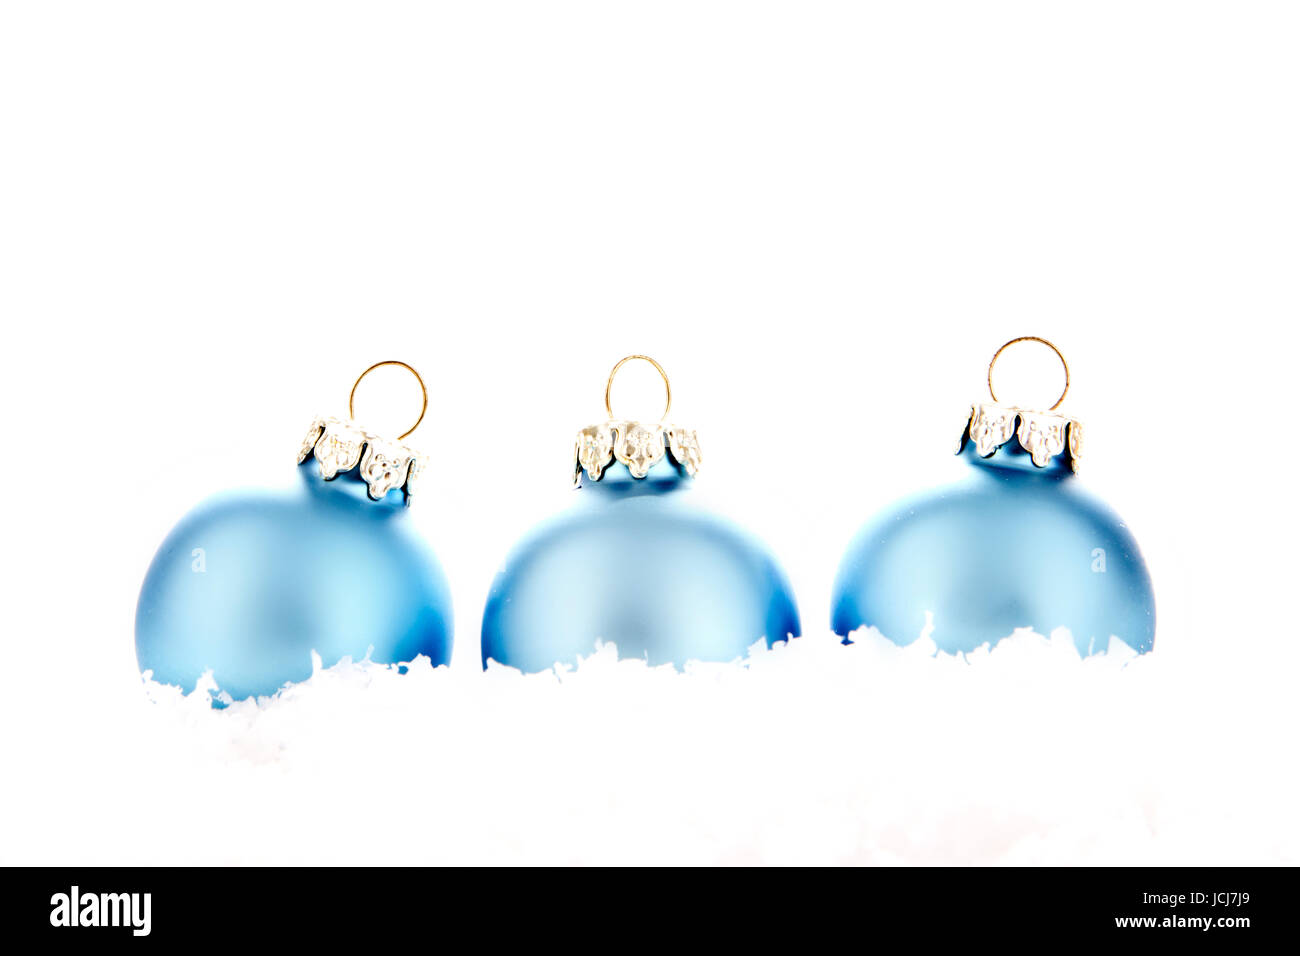 Weihnachtskugeln Blau.Weihnachtskugeln Blau Stock Photos Weihnachtskugeln Blau Stock